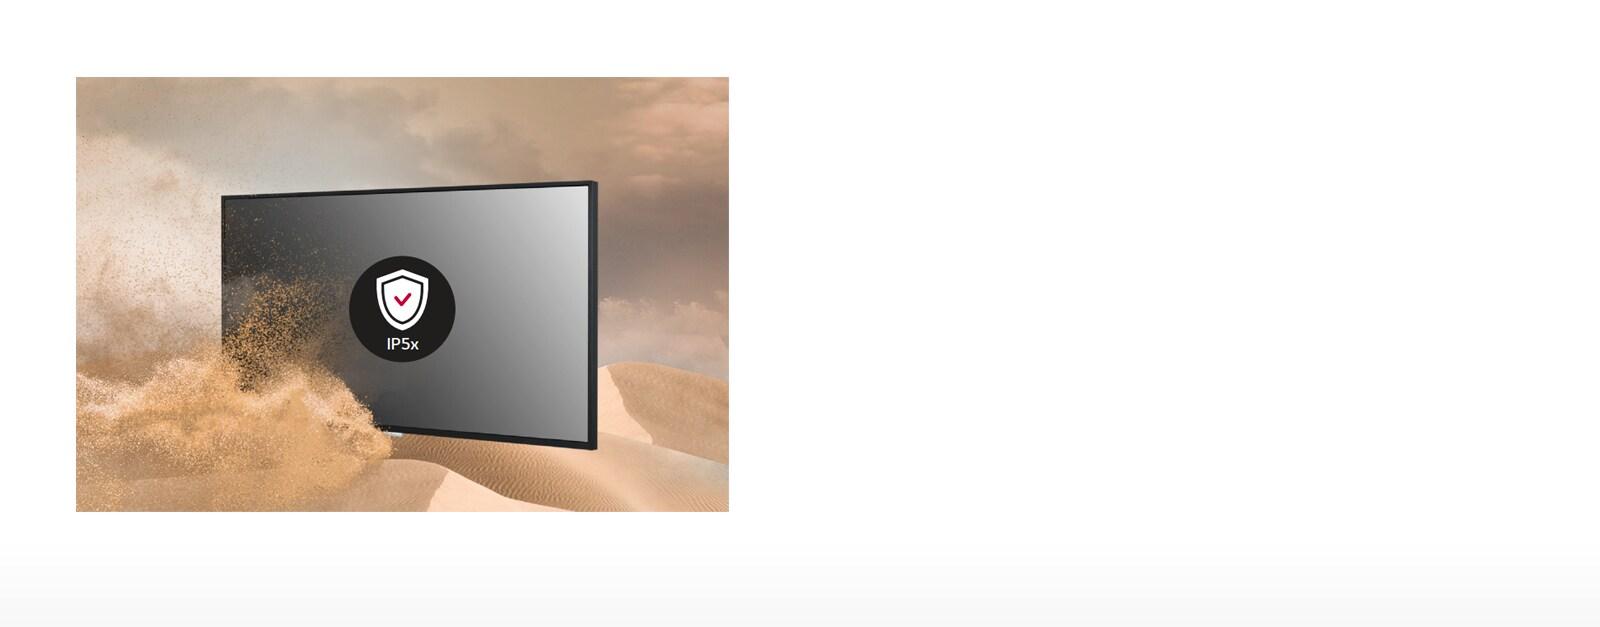 LG 65UM3DF IP5x Certified Design1